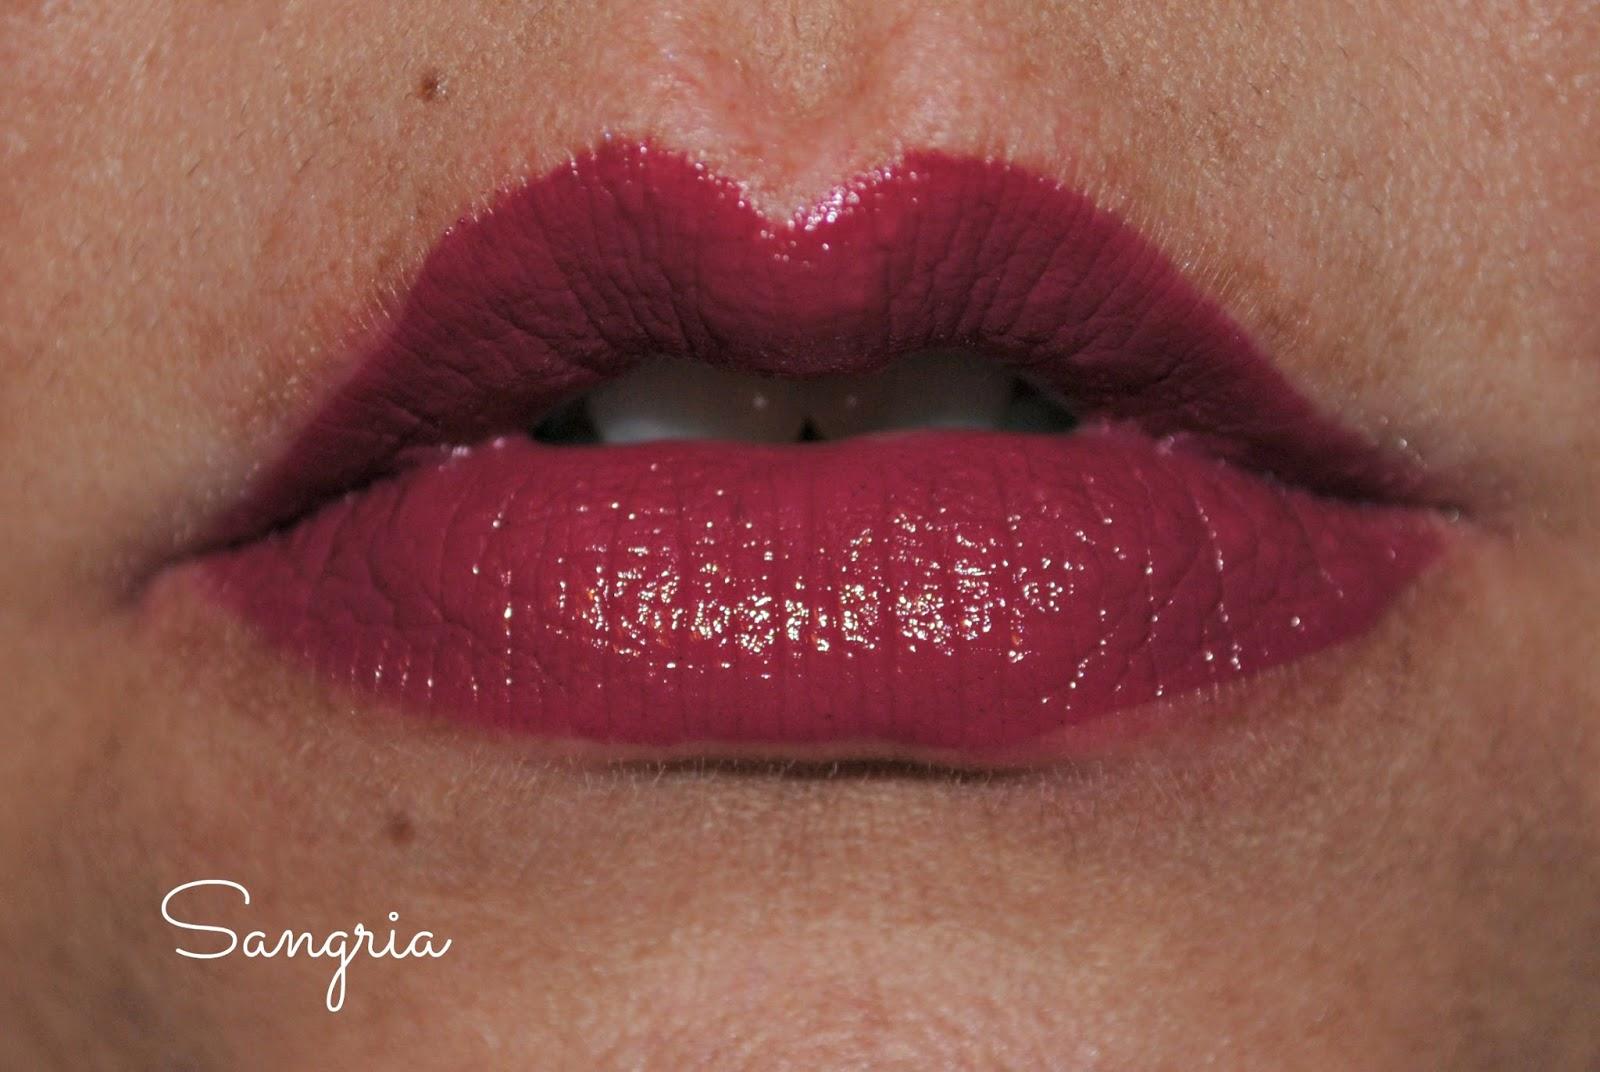 Average Jo Avon Ultra Color Lipstick Swatches Plumswines